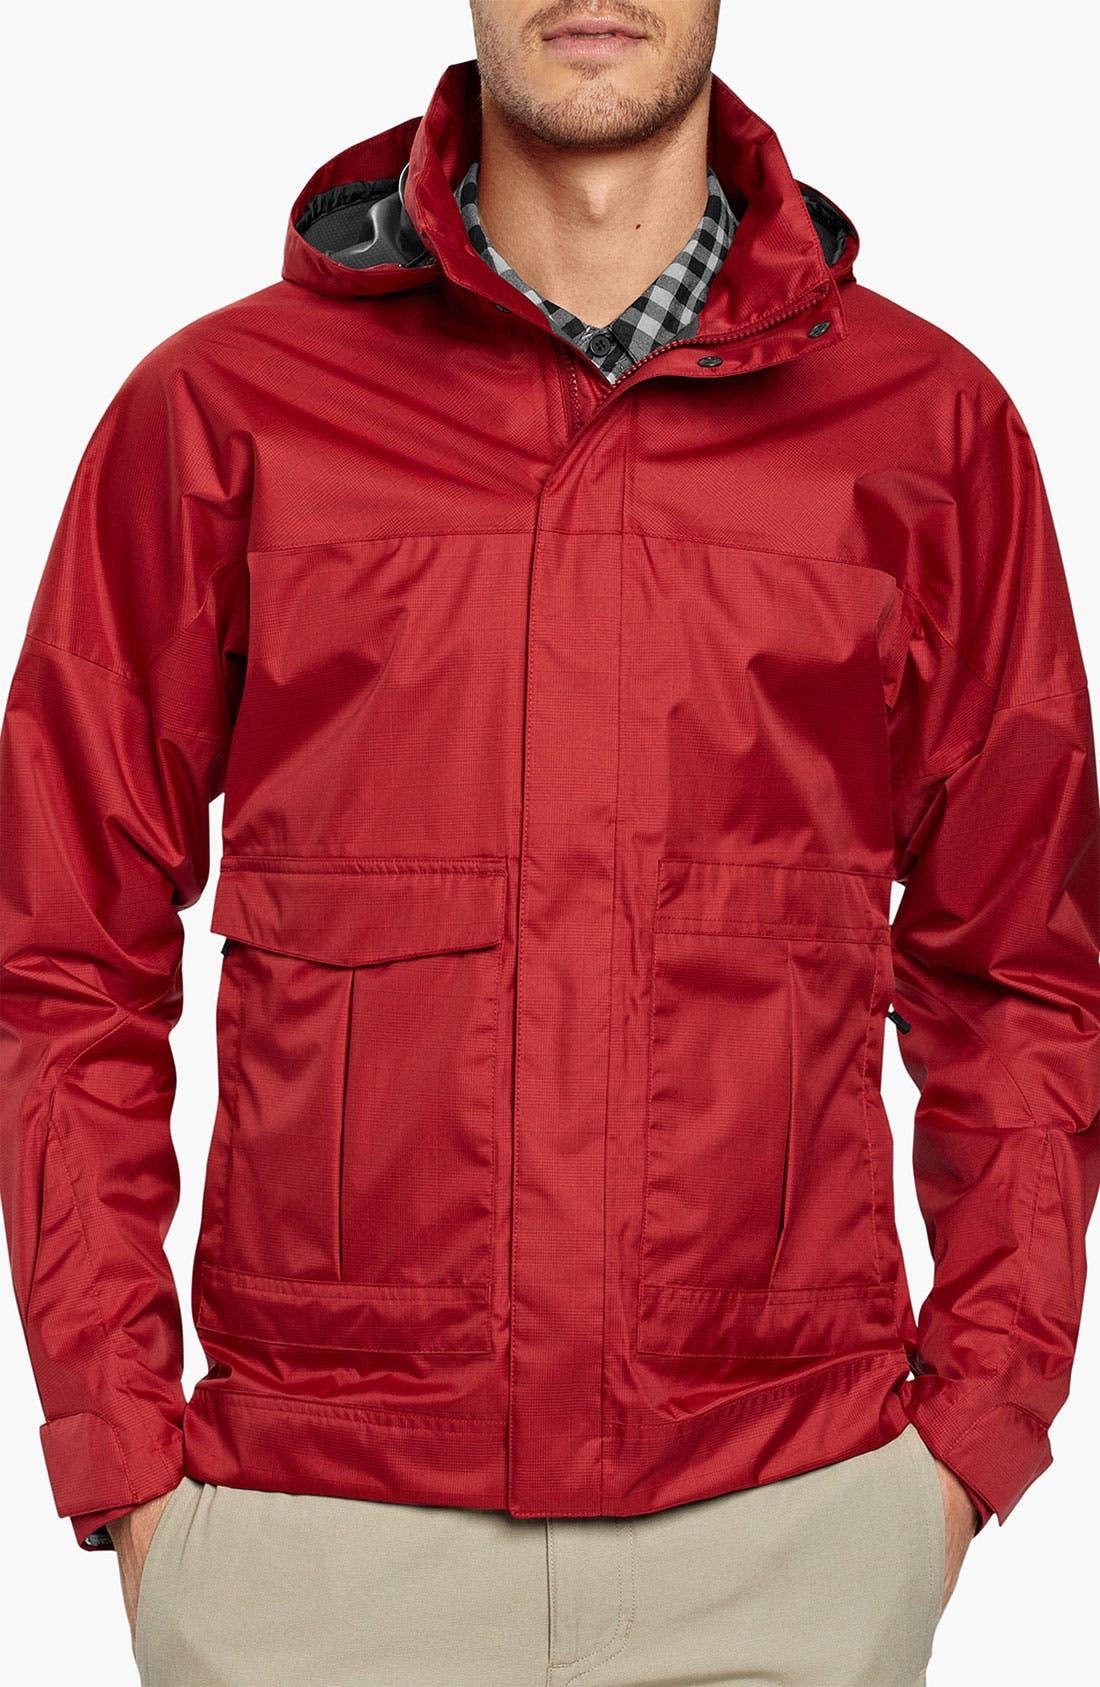 Alternate Image 1 Selected - Nau 'Deft' Jacket